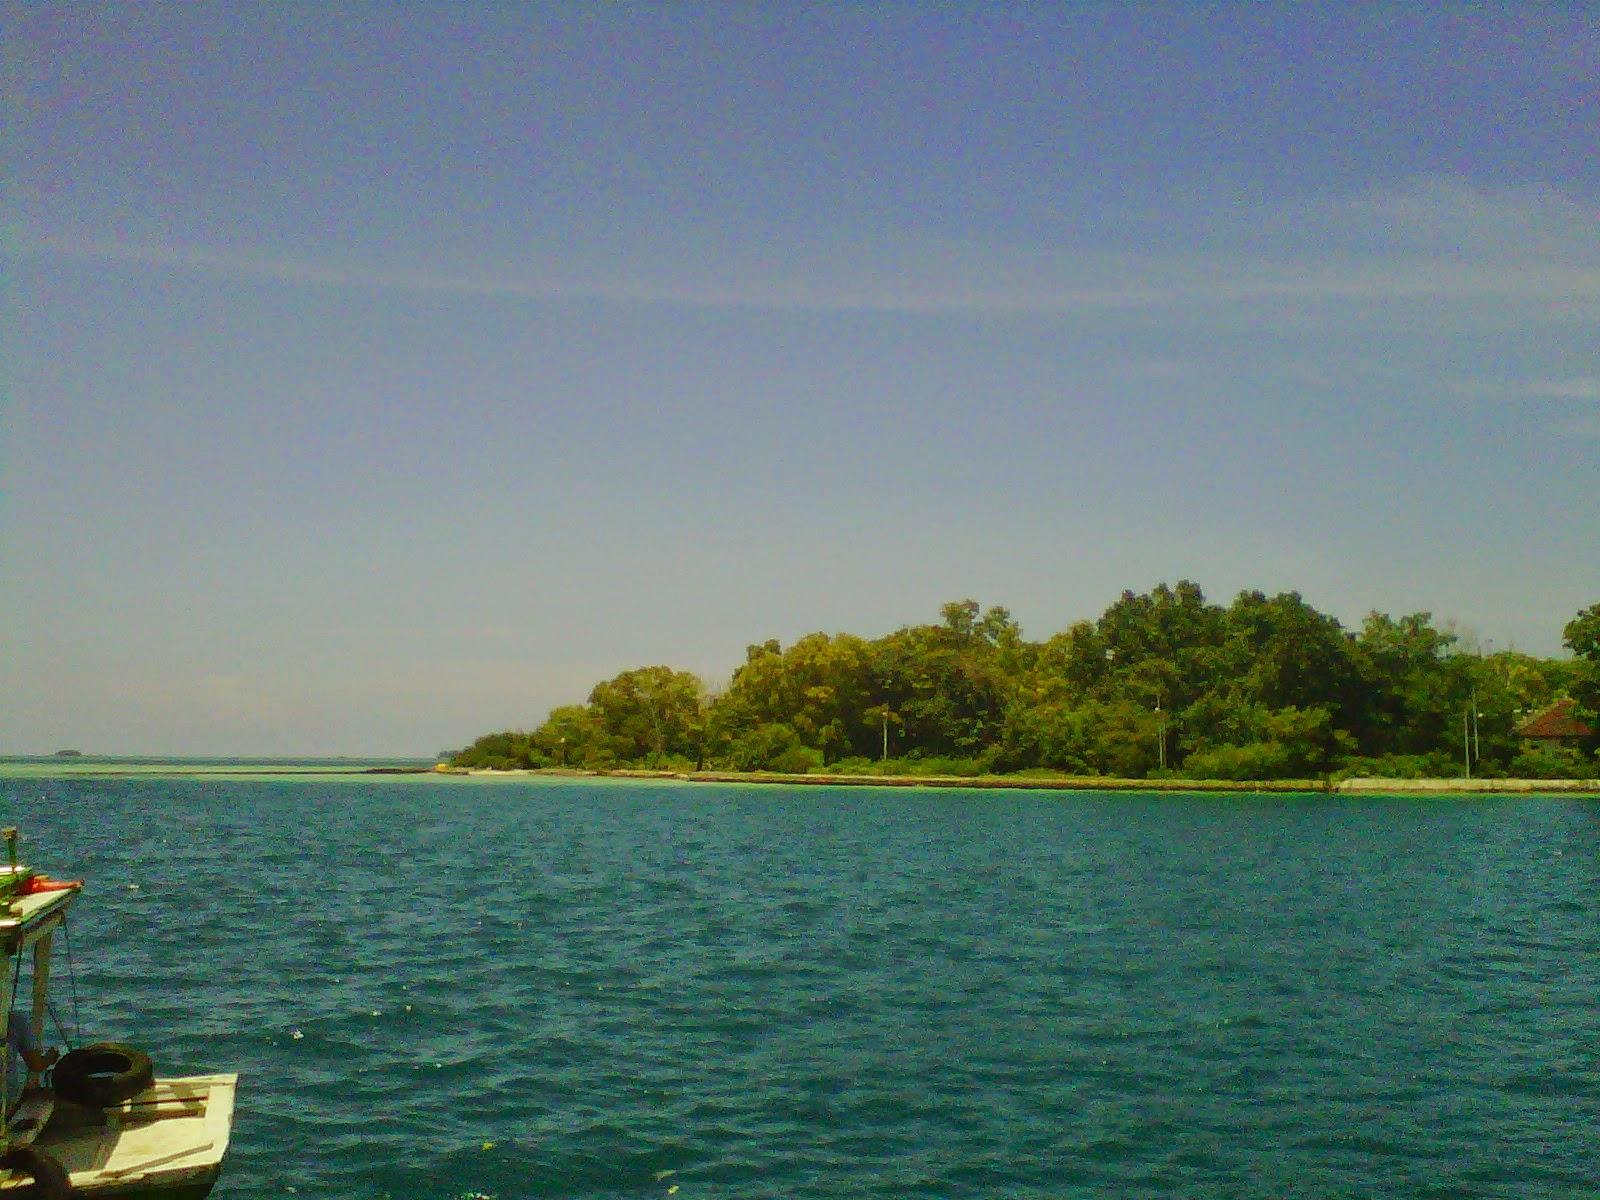 View Pemandanngan Pulau Karya Kepulauan Seribu